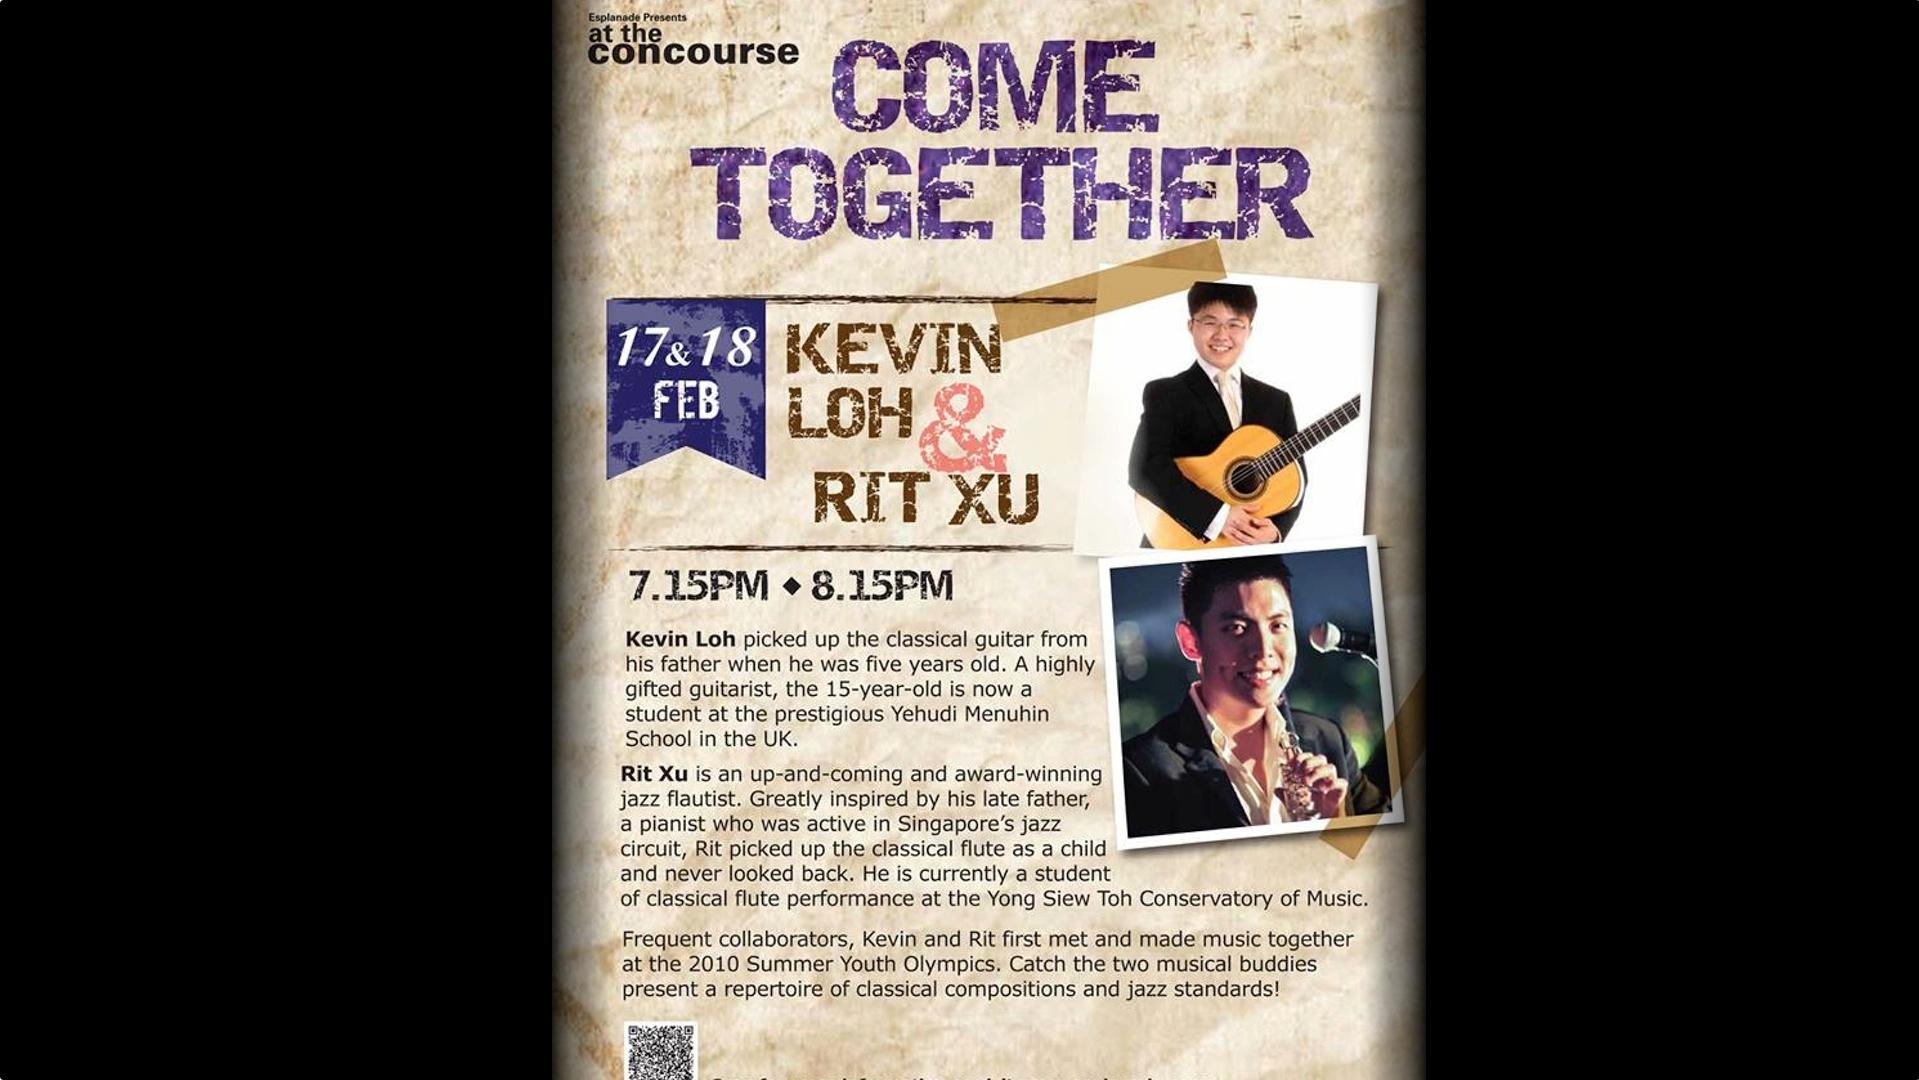 Kevin Loh & Rit Xu